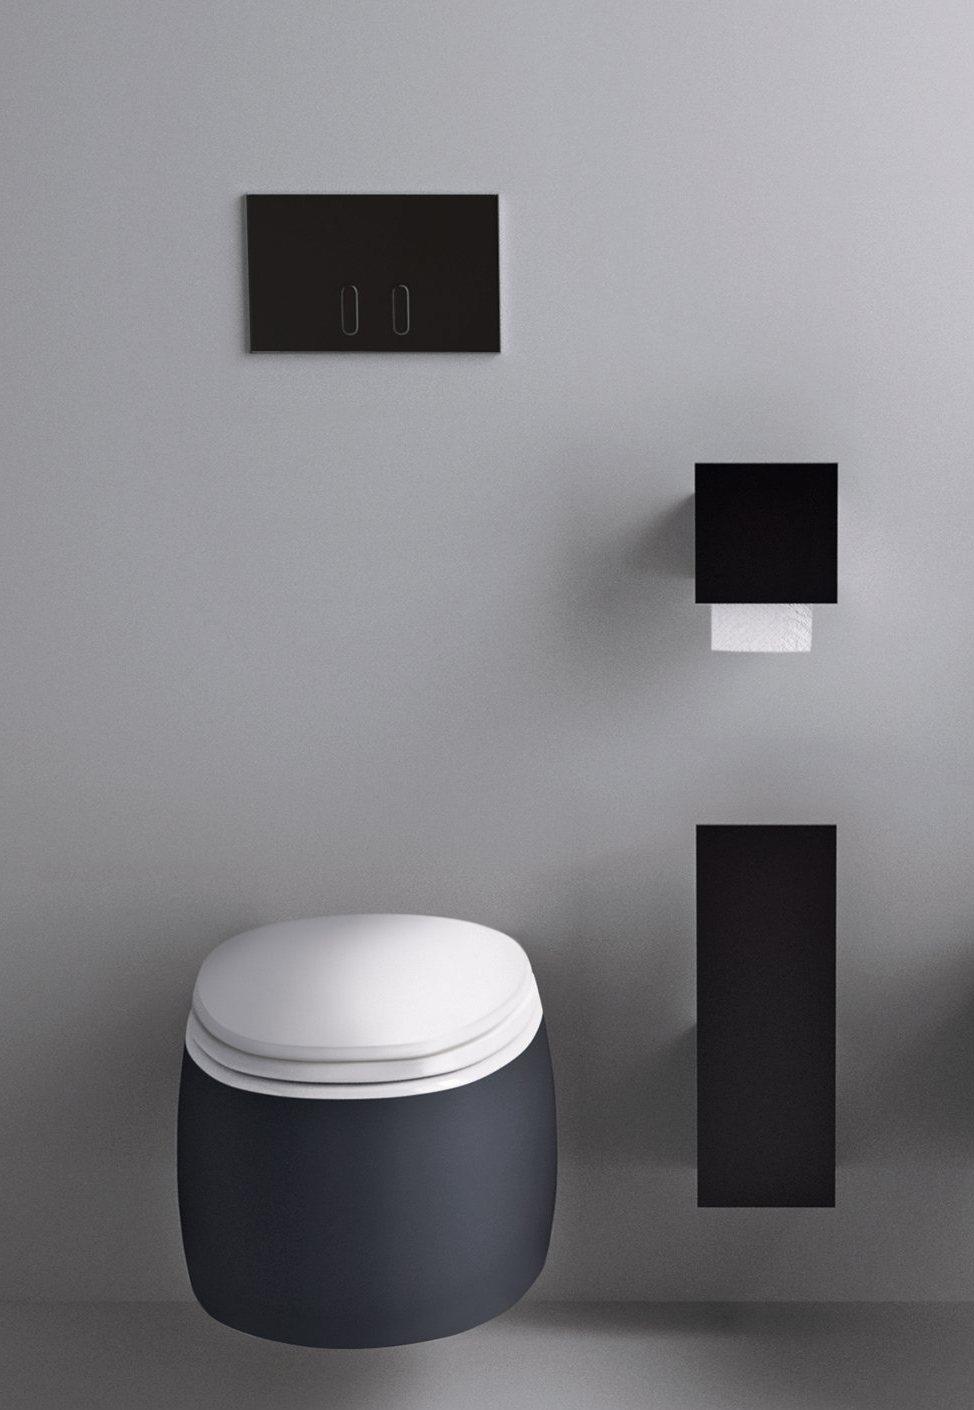 Sen Flush Plate Bathware Accessories Sen System